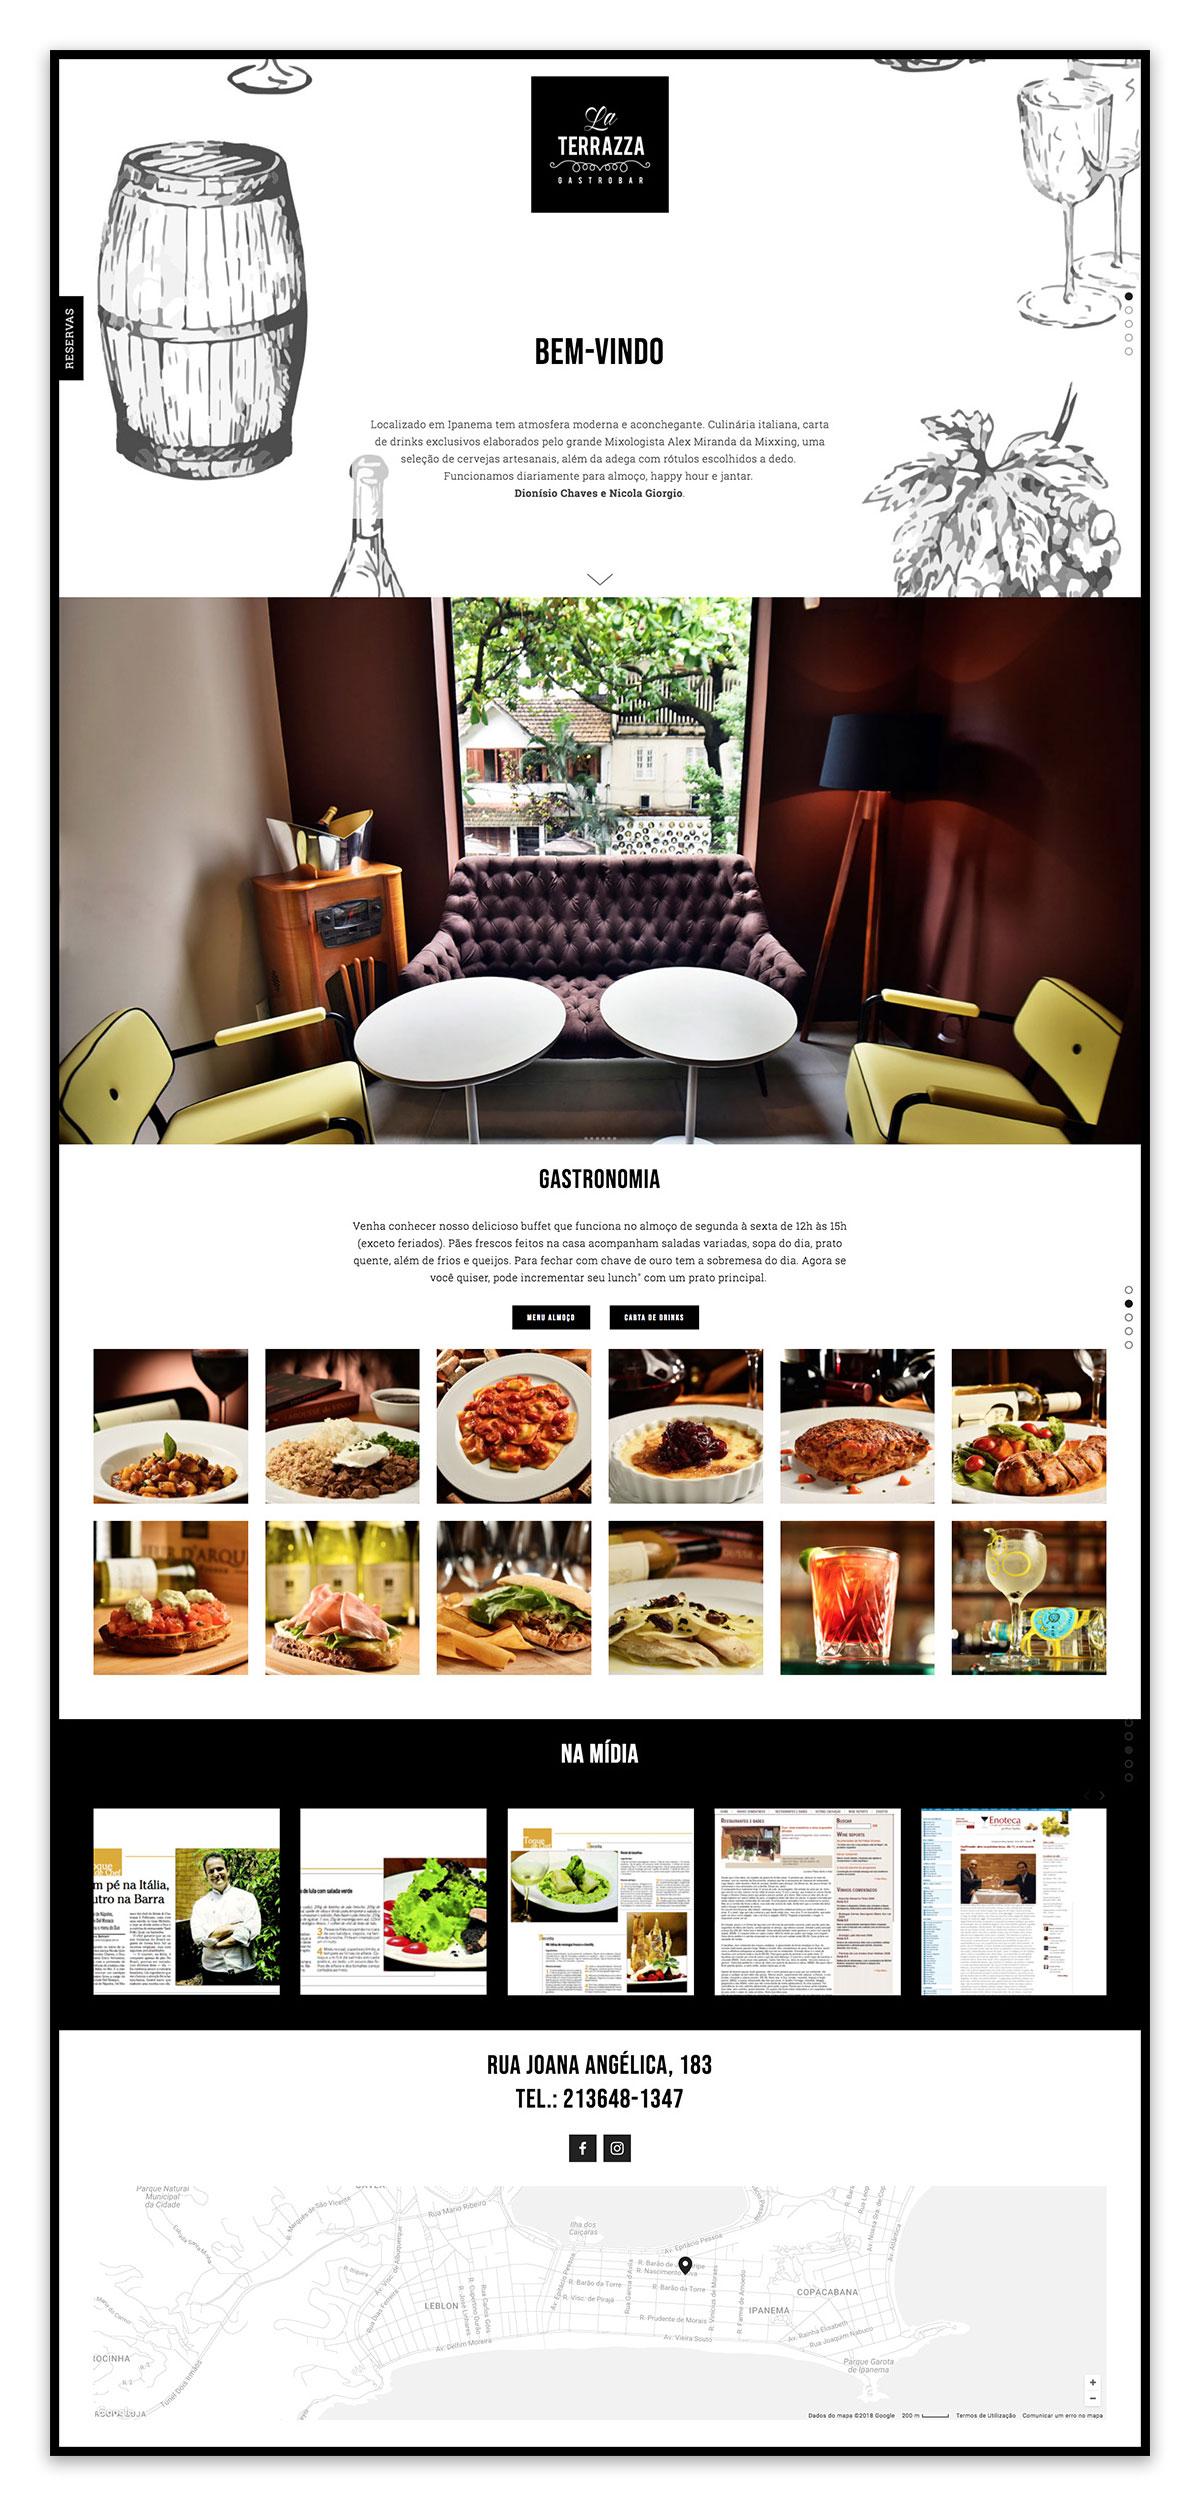 screencapture-laterrazzario-br-home-teste-1518590557759.jpg